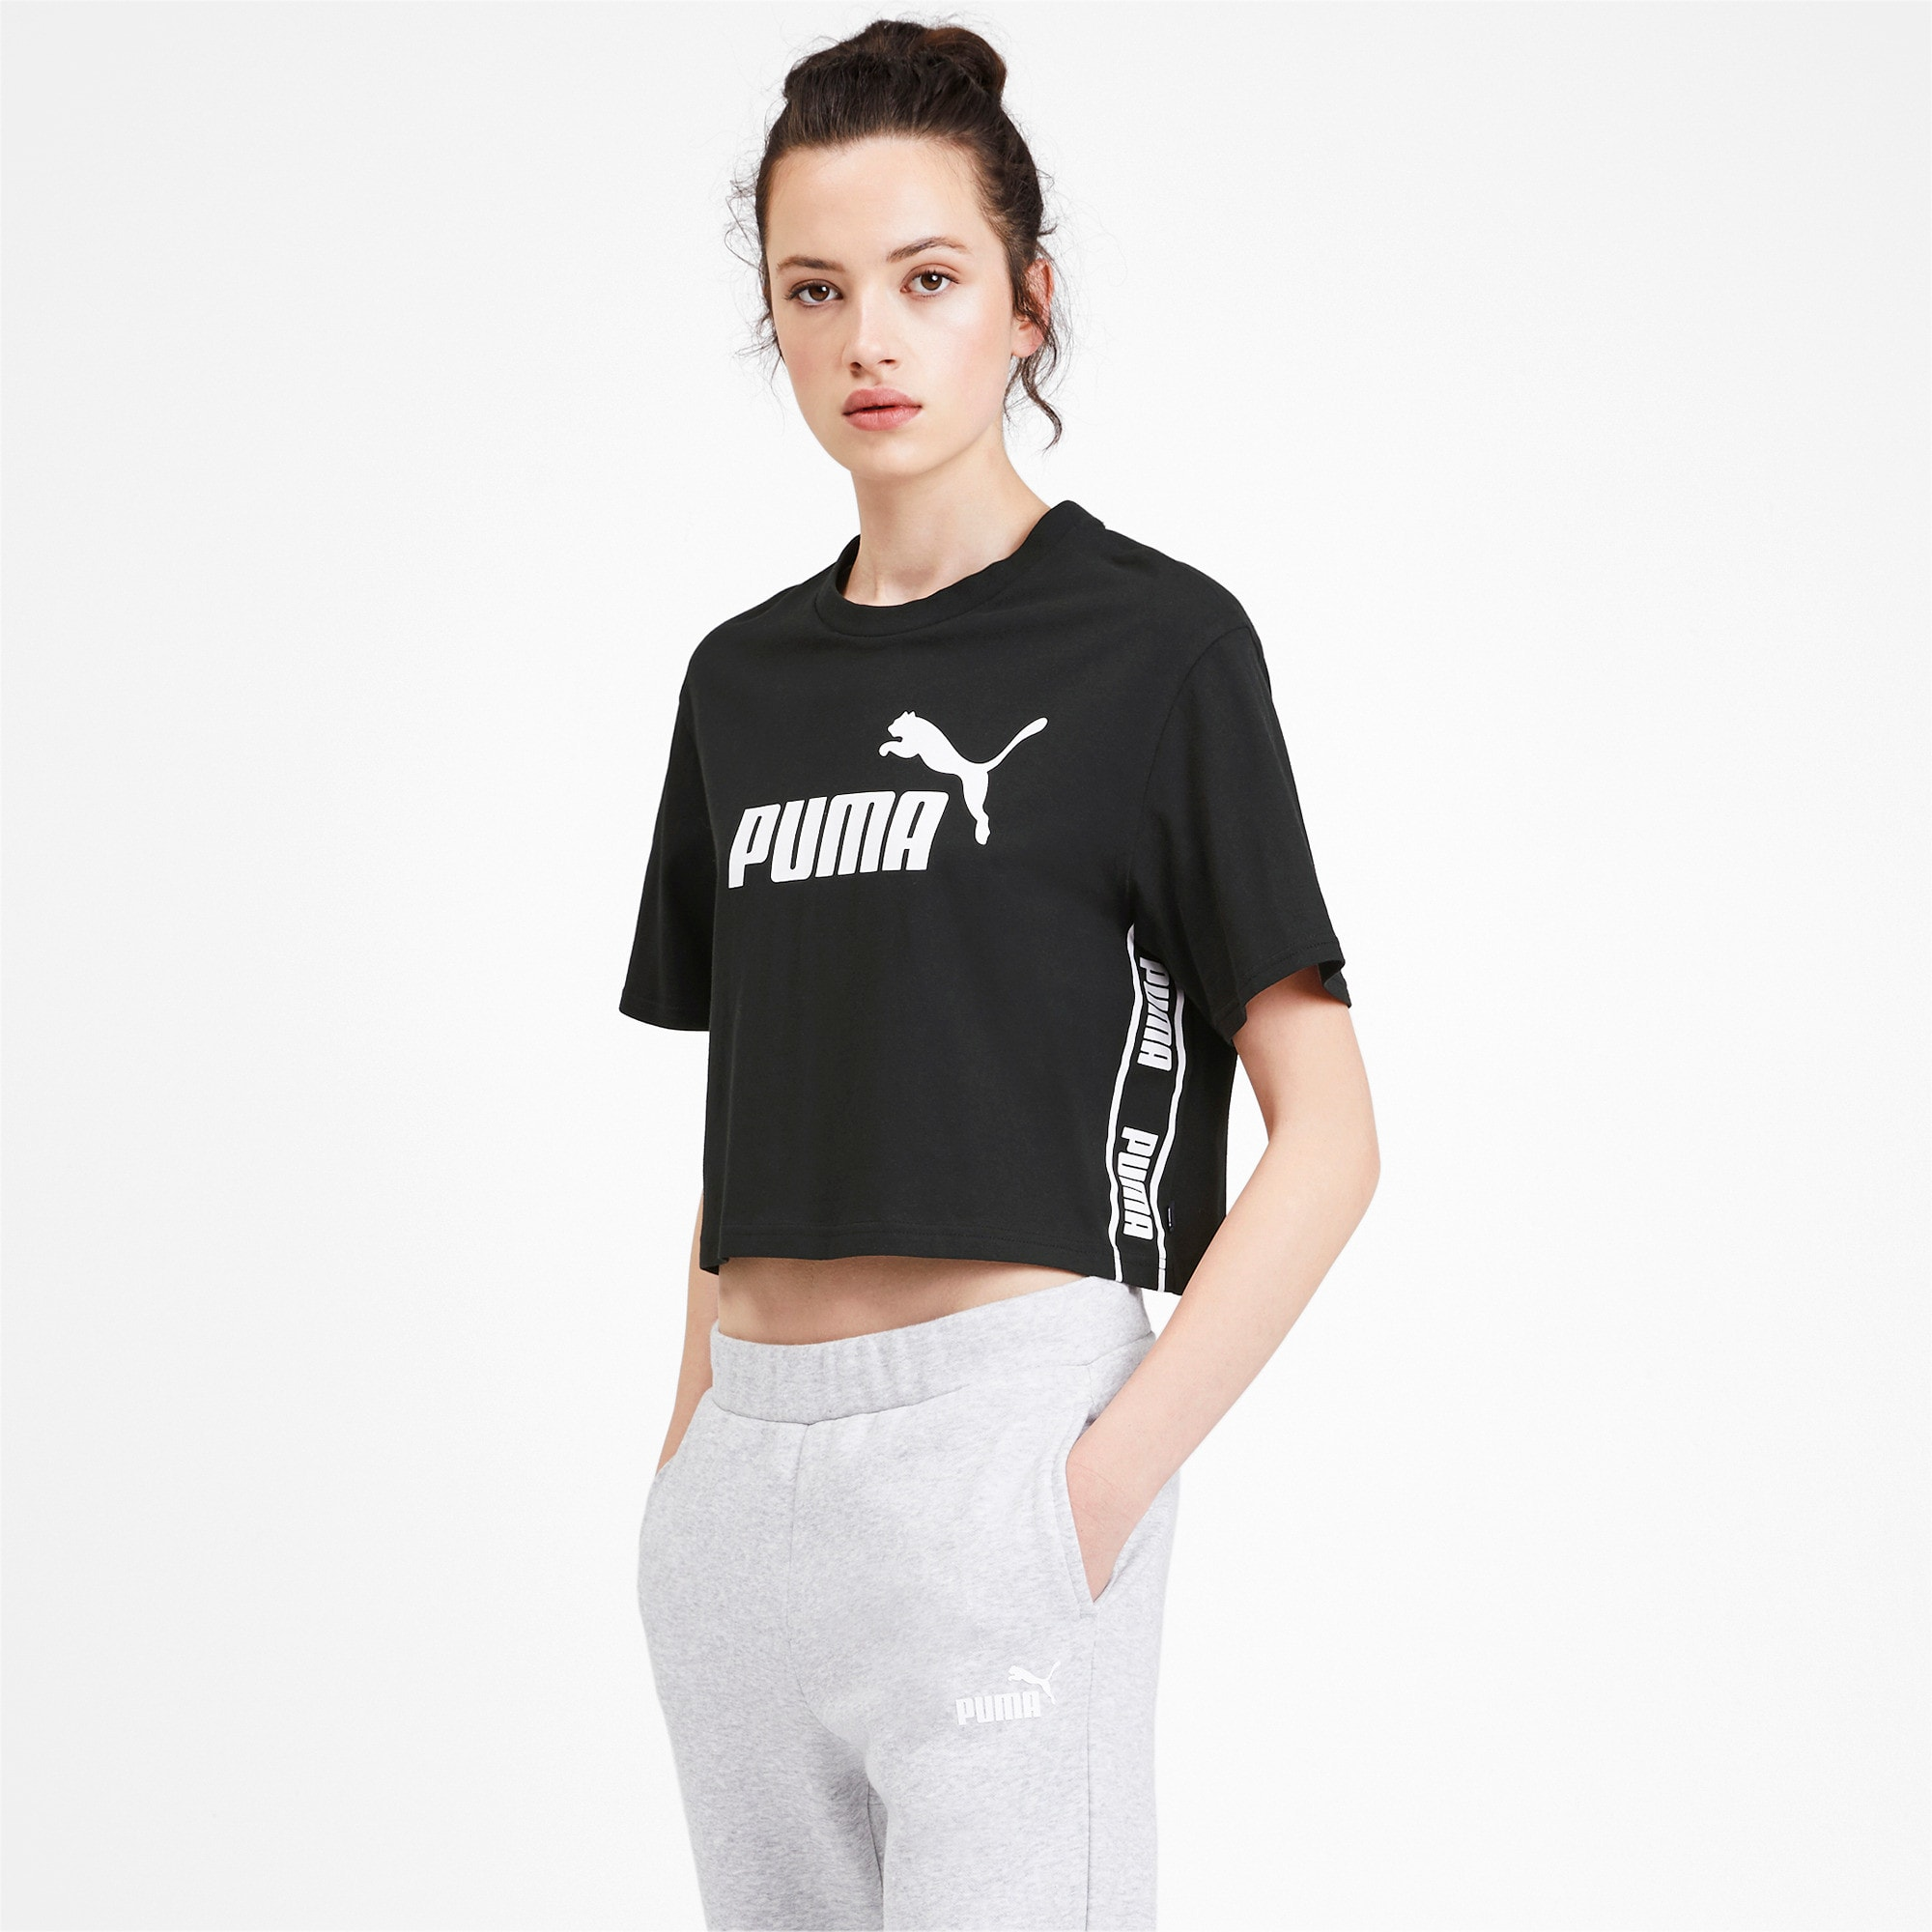 Miniatura 2 de Camiseta corta Amplified para mujer, Puma Black, mediano